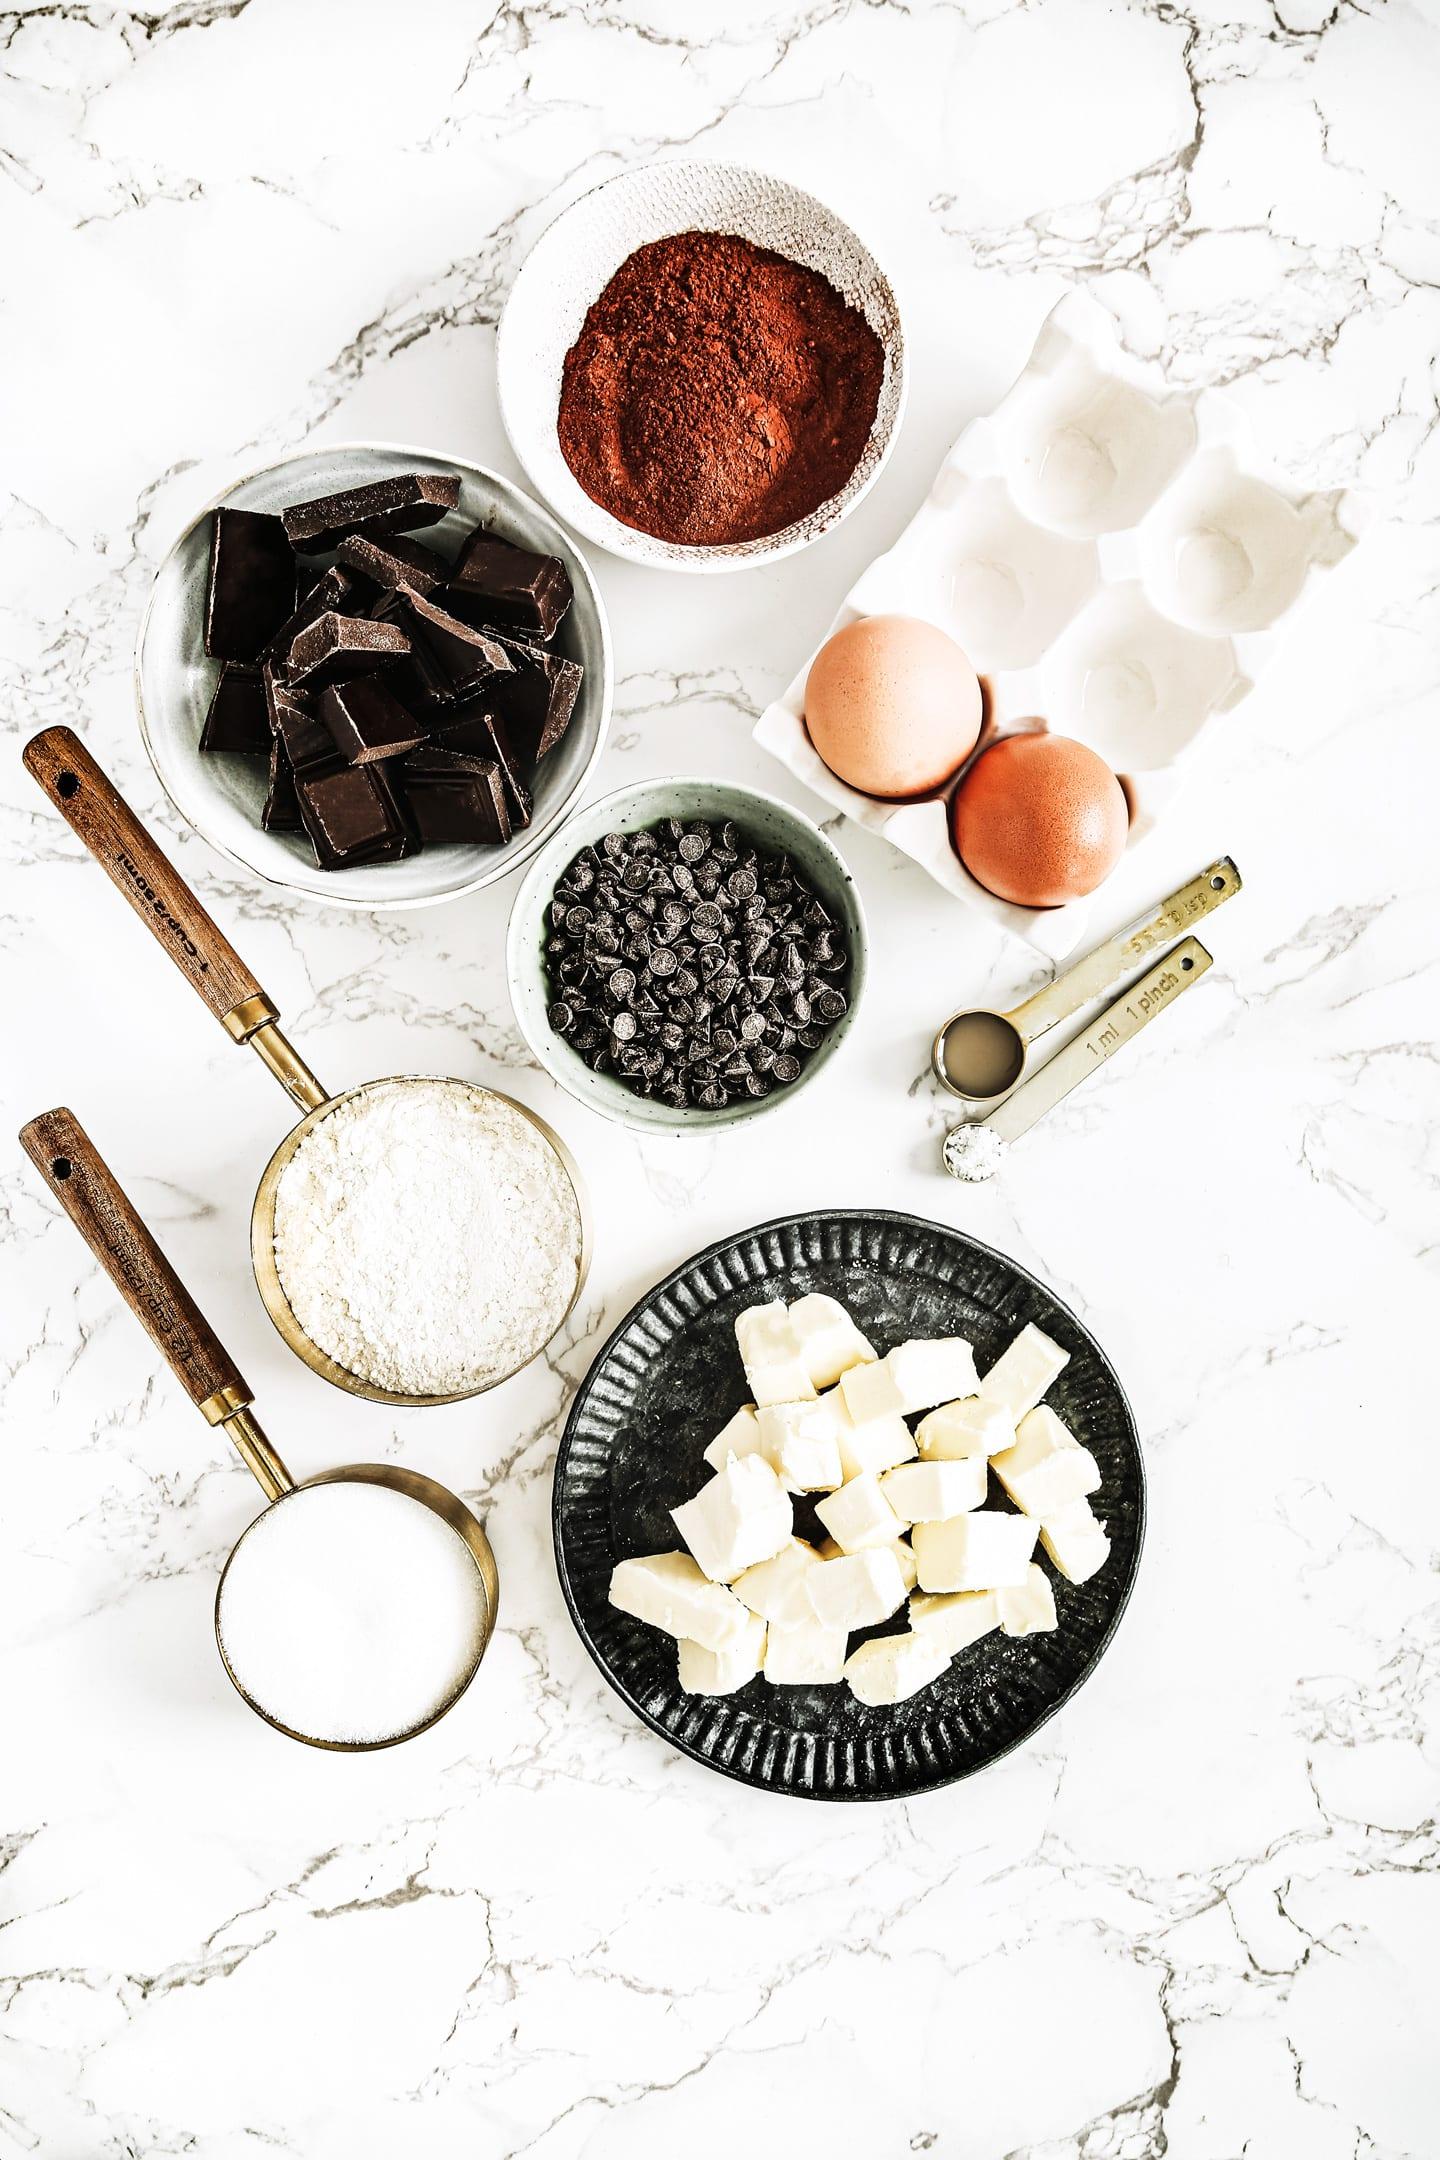 Ingredient to make a brownies